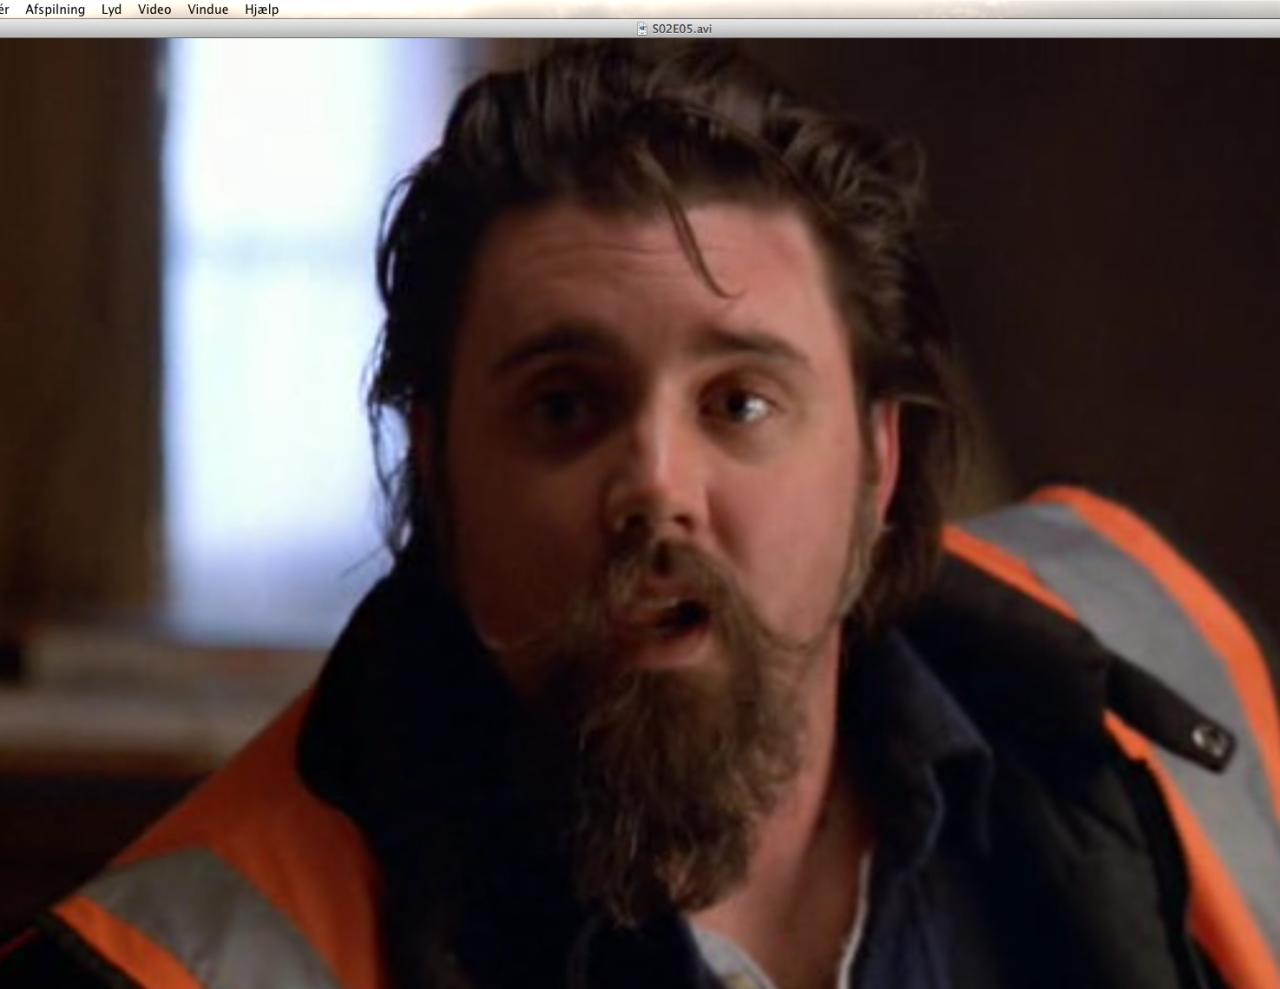 Alle dem der synes at John fra The Wire ligner John Mogensen rækker like-fingeren op    Ing?! :)